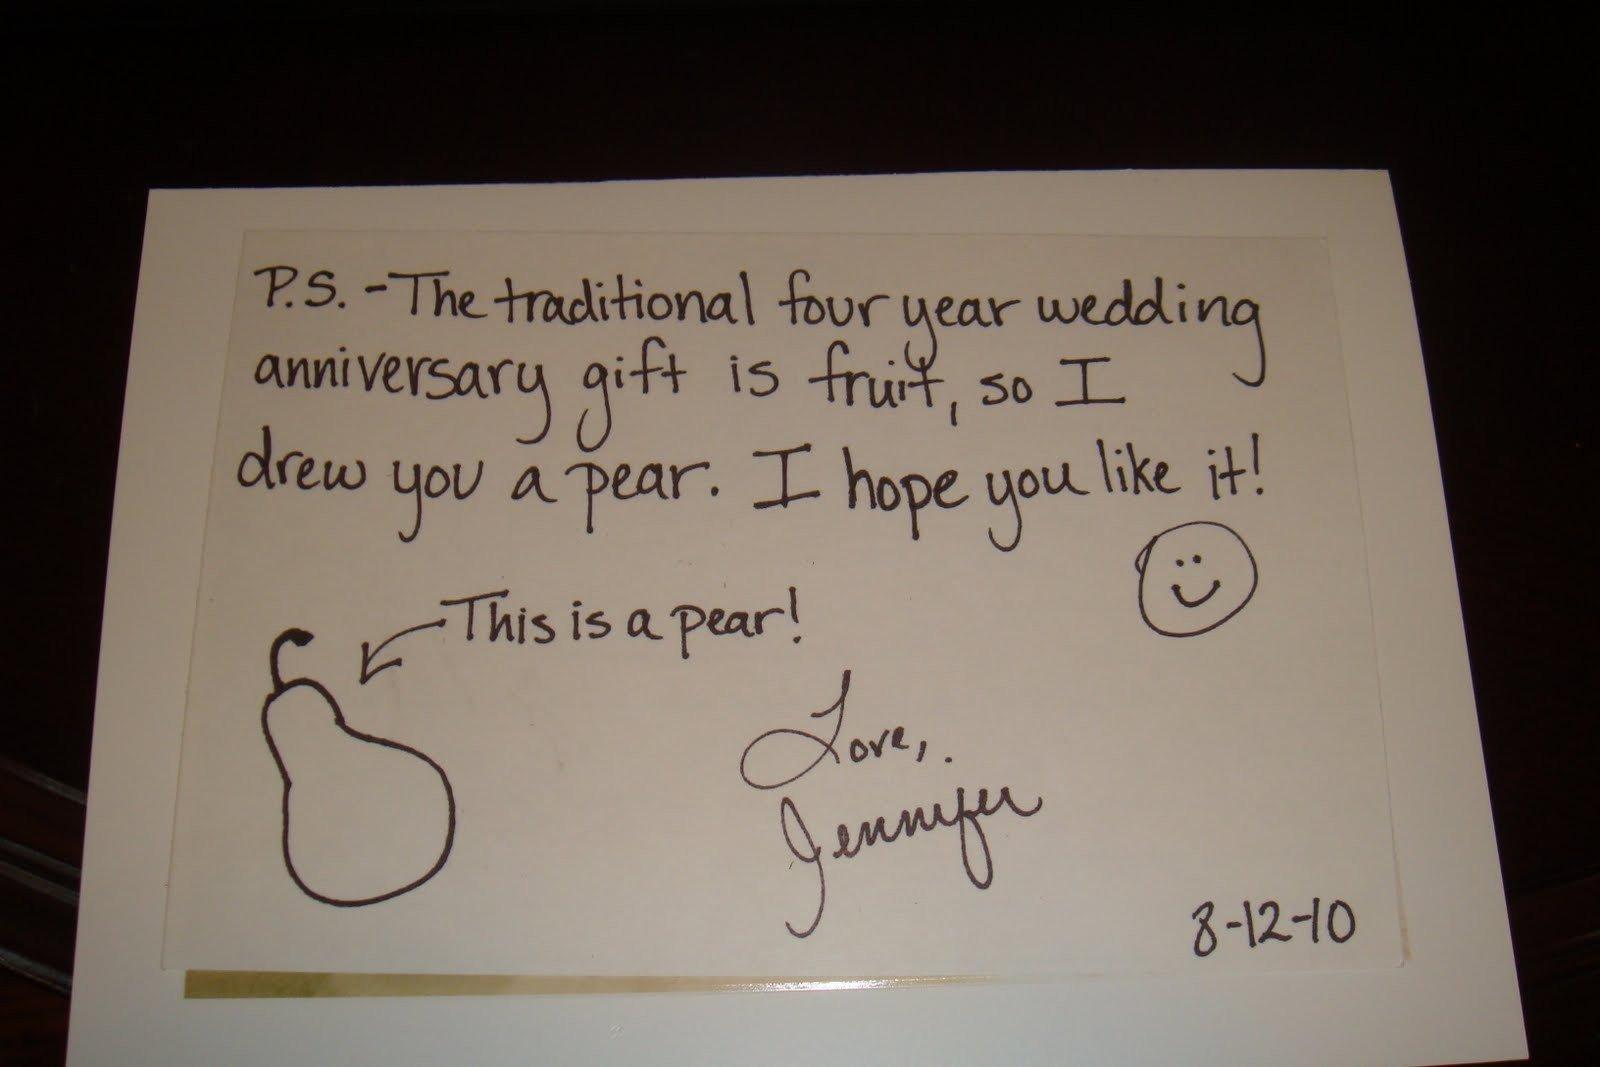 10 Fantastic Four Year Anniversary Gift Ideas fourth wedding anniversary gift ideas for him fresh 4 year wedding 4 2021